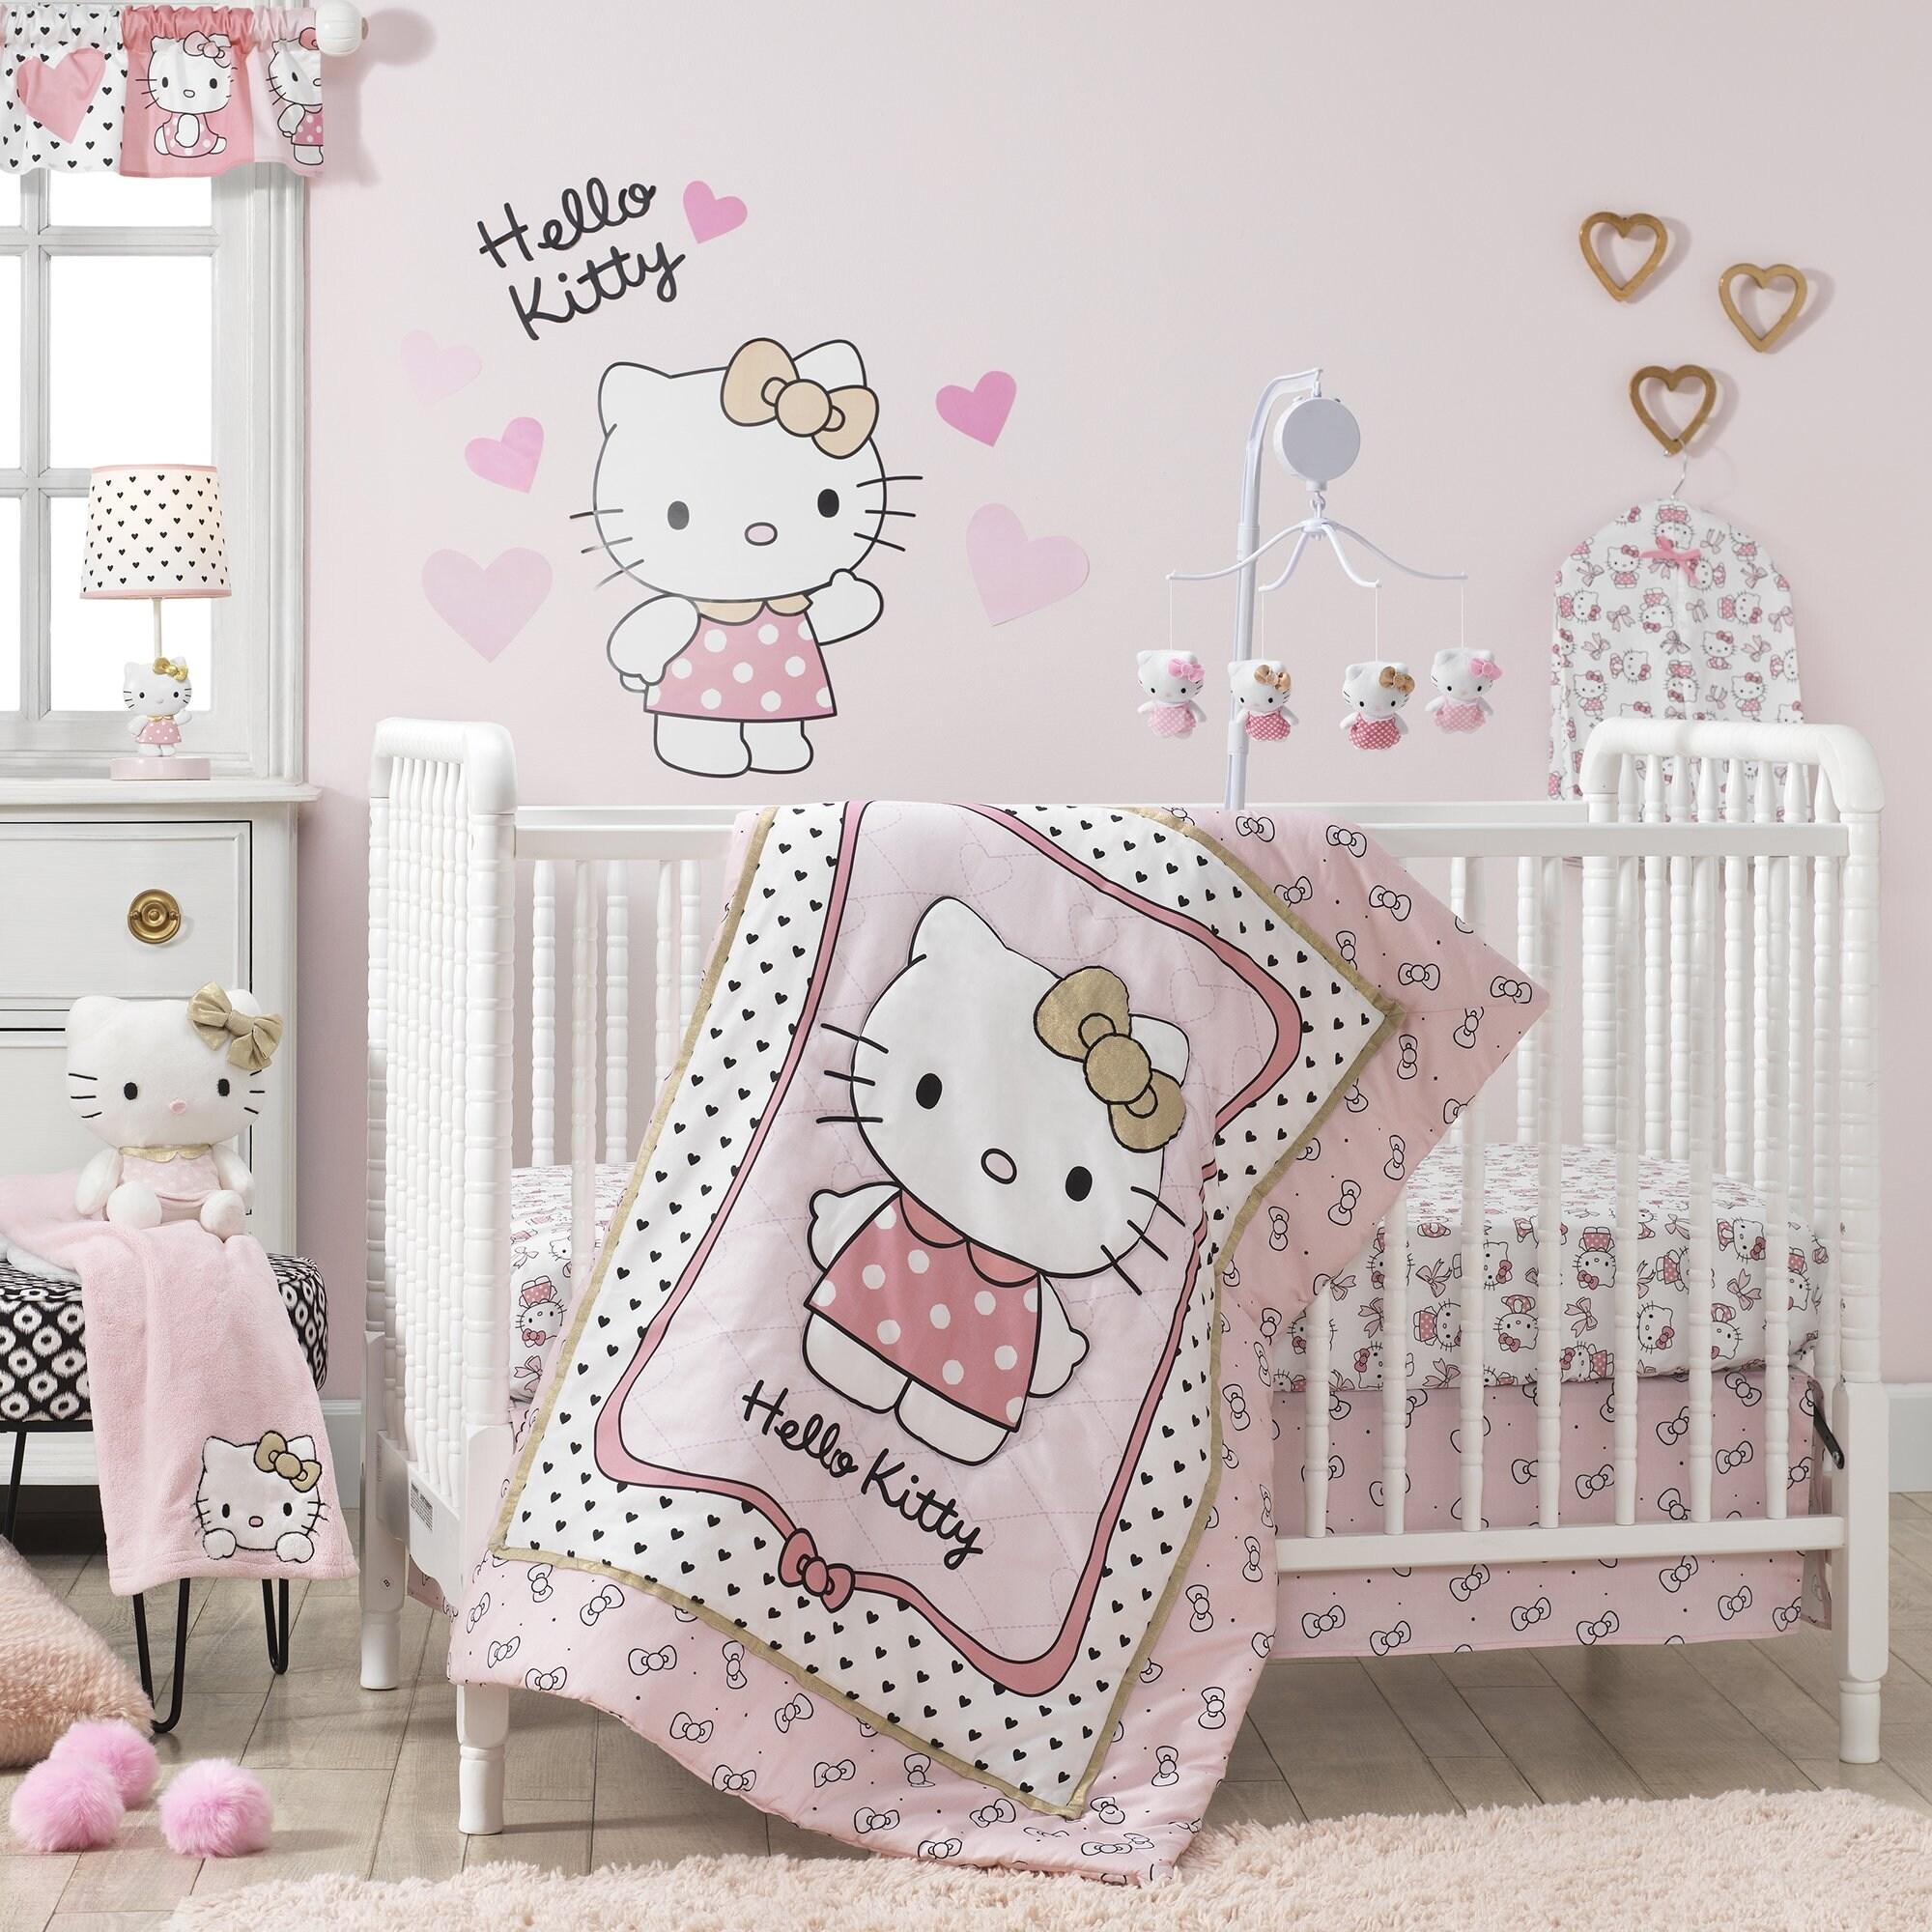 Shop Bedtime Originals Hello Kitty Luv 3 Piece Crib Bedding Set